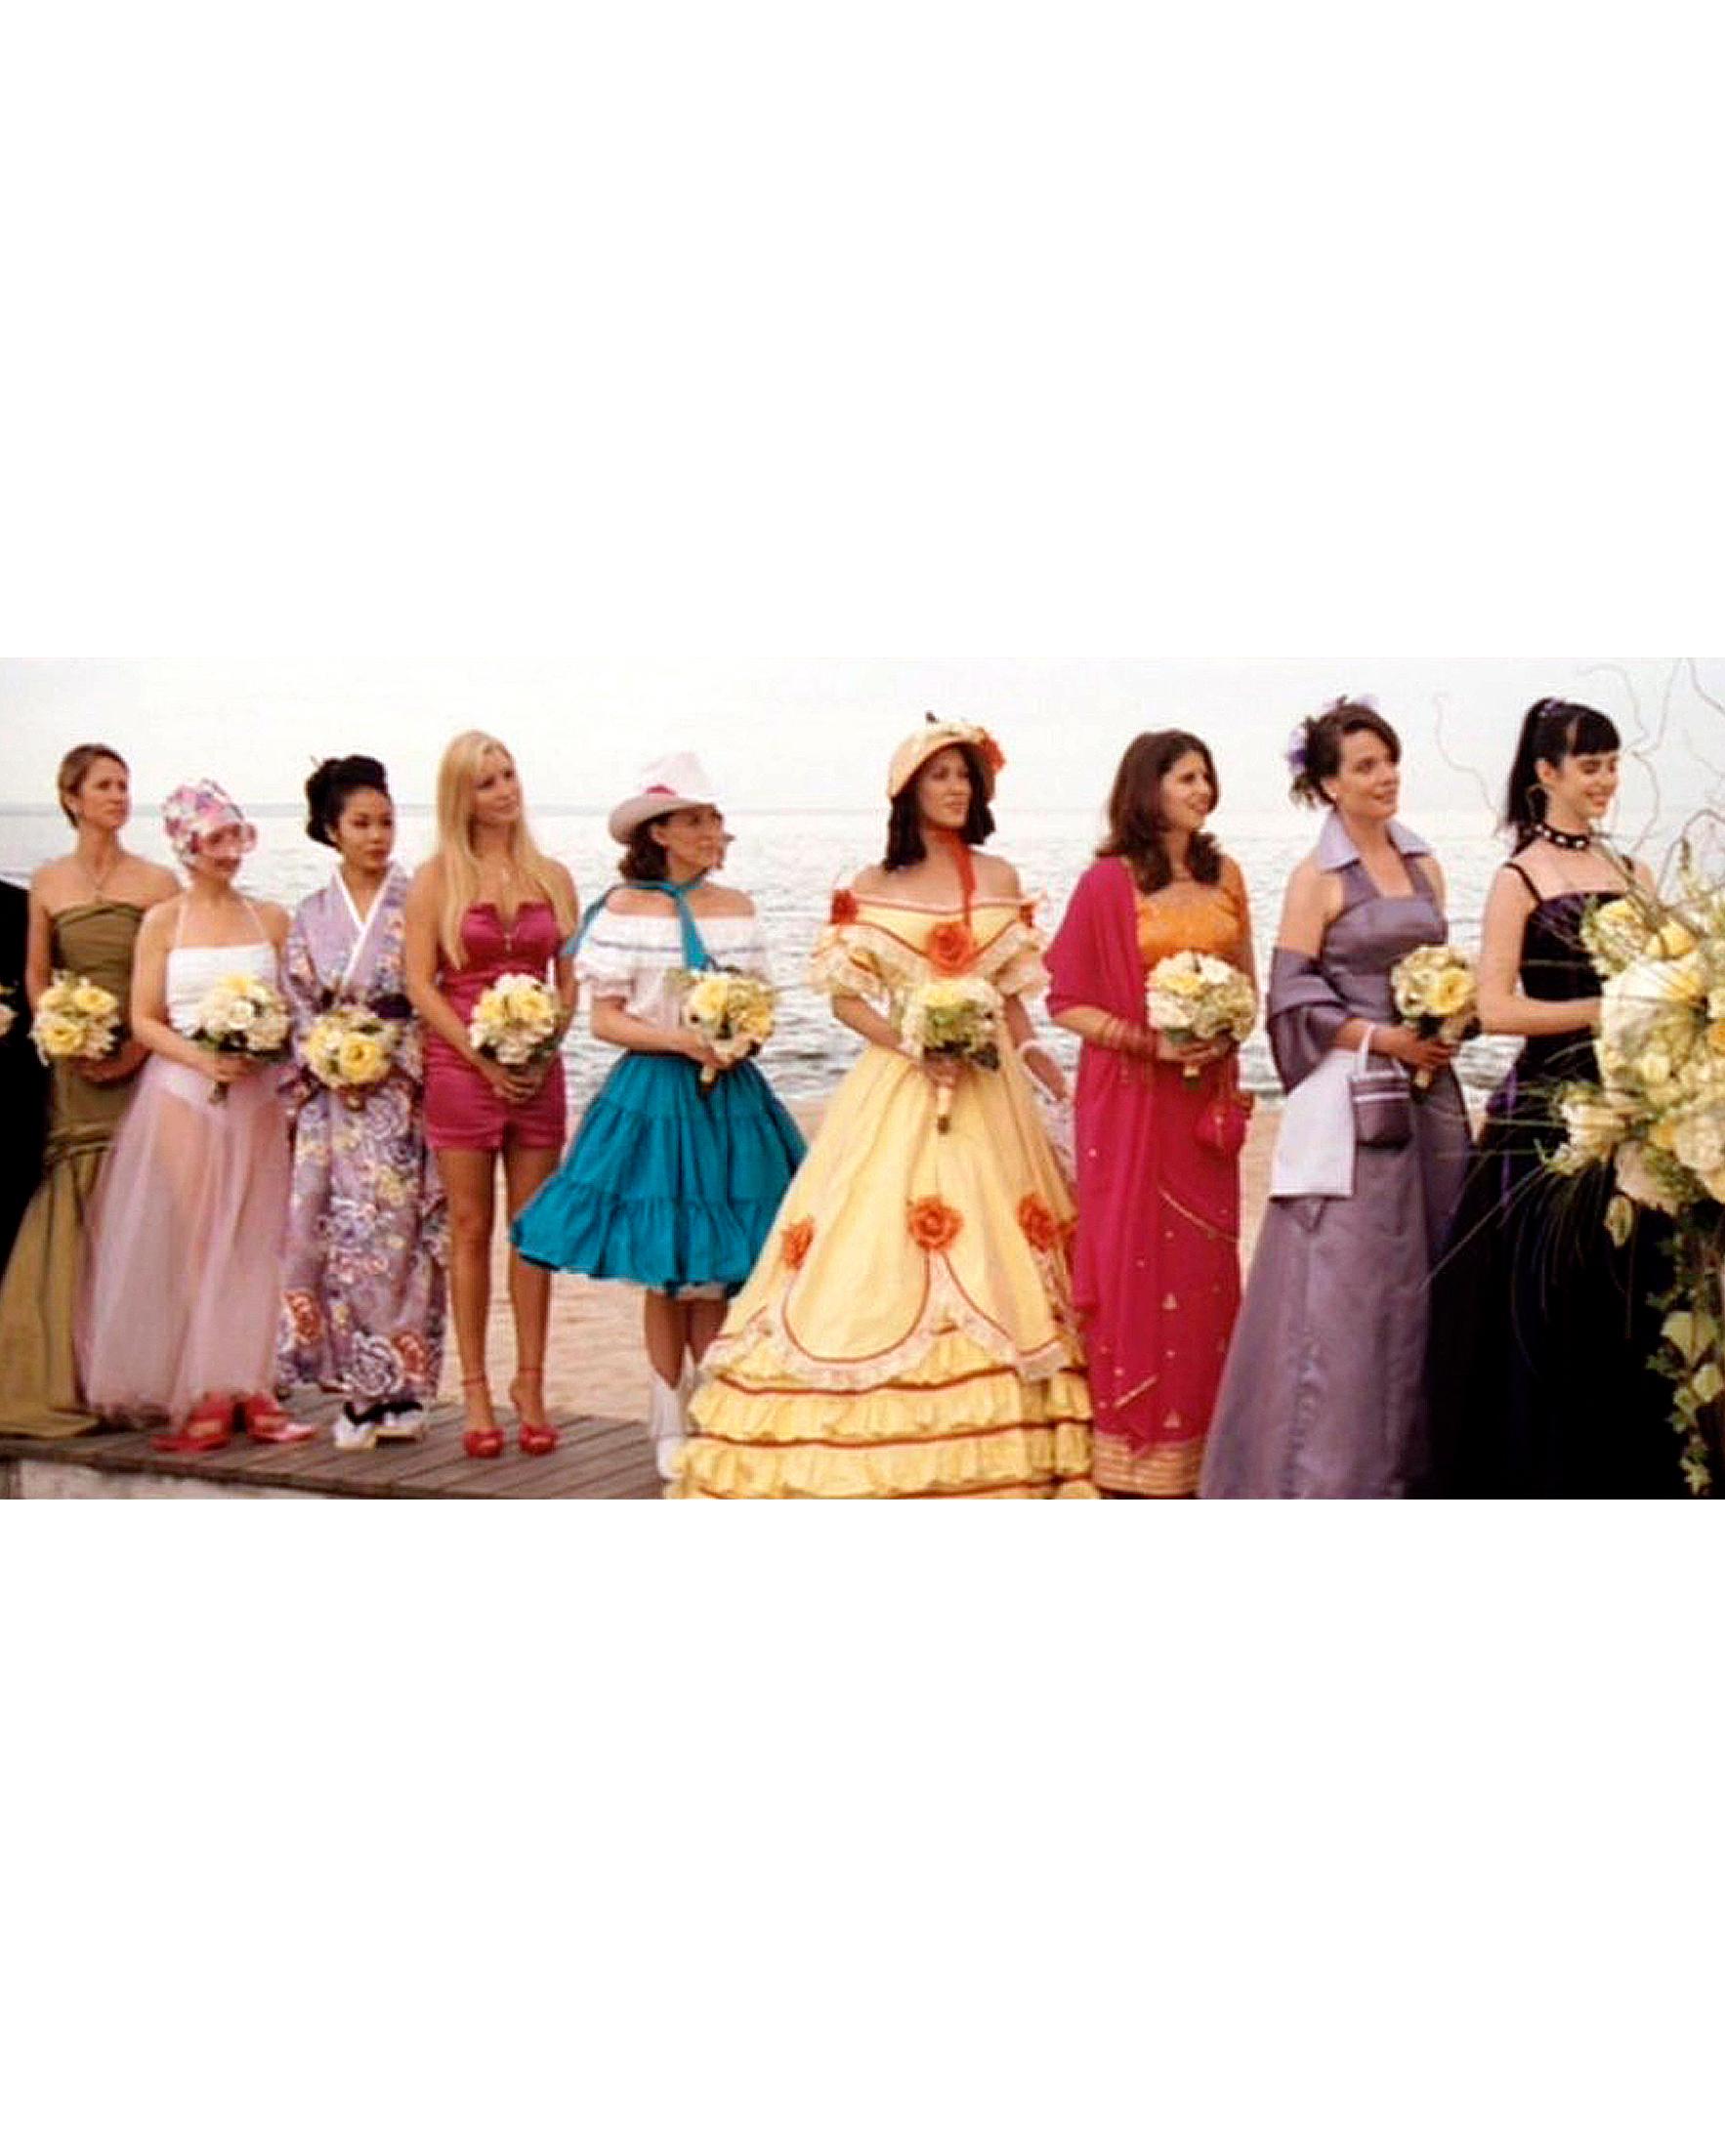 27-dresses-bridesmaids-1215.jpg